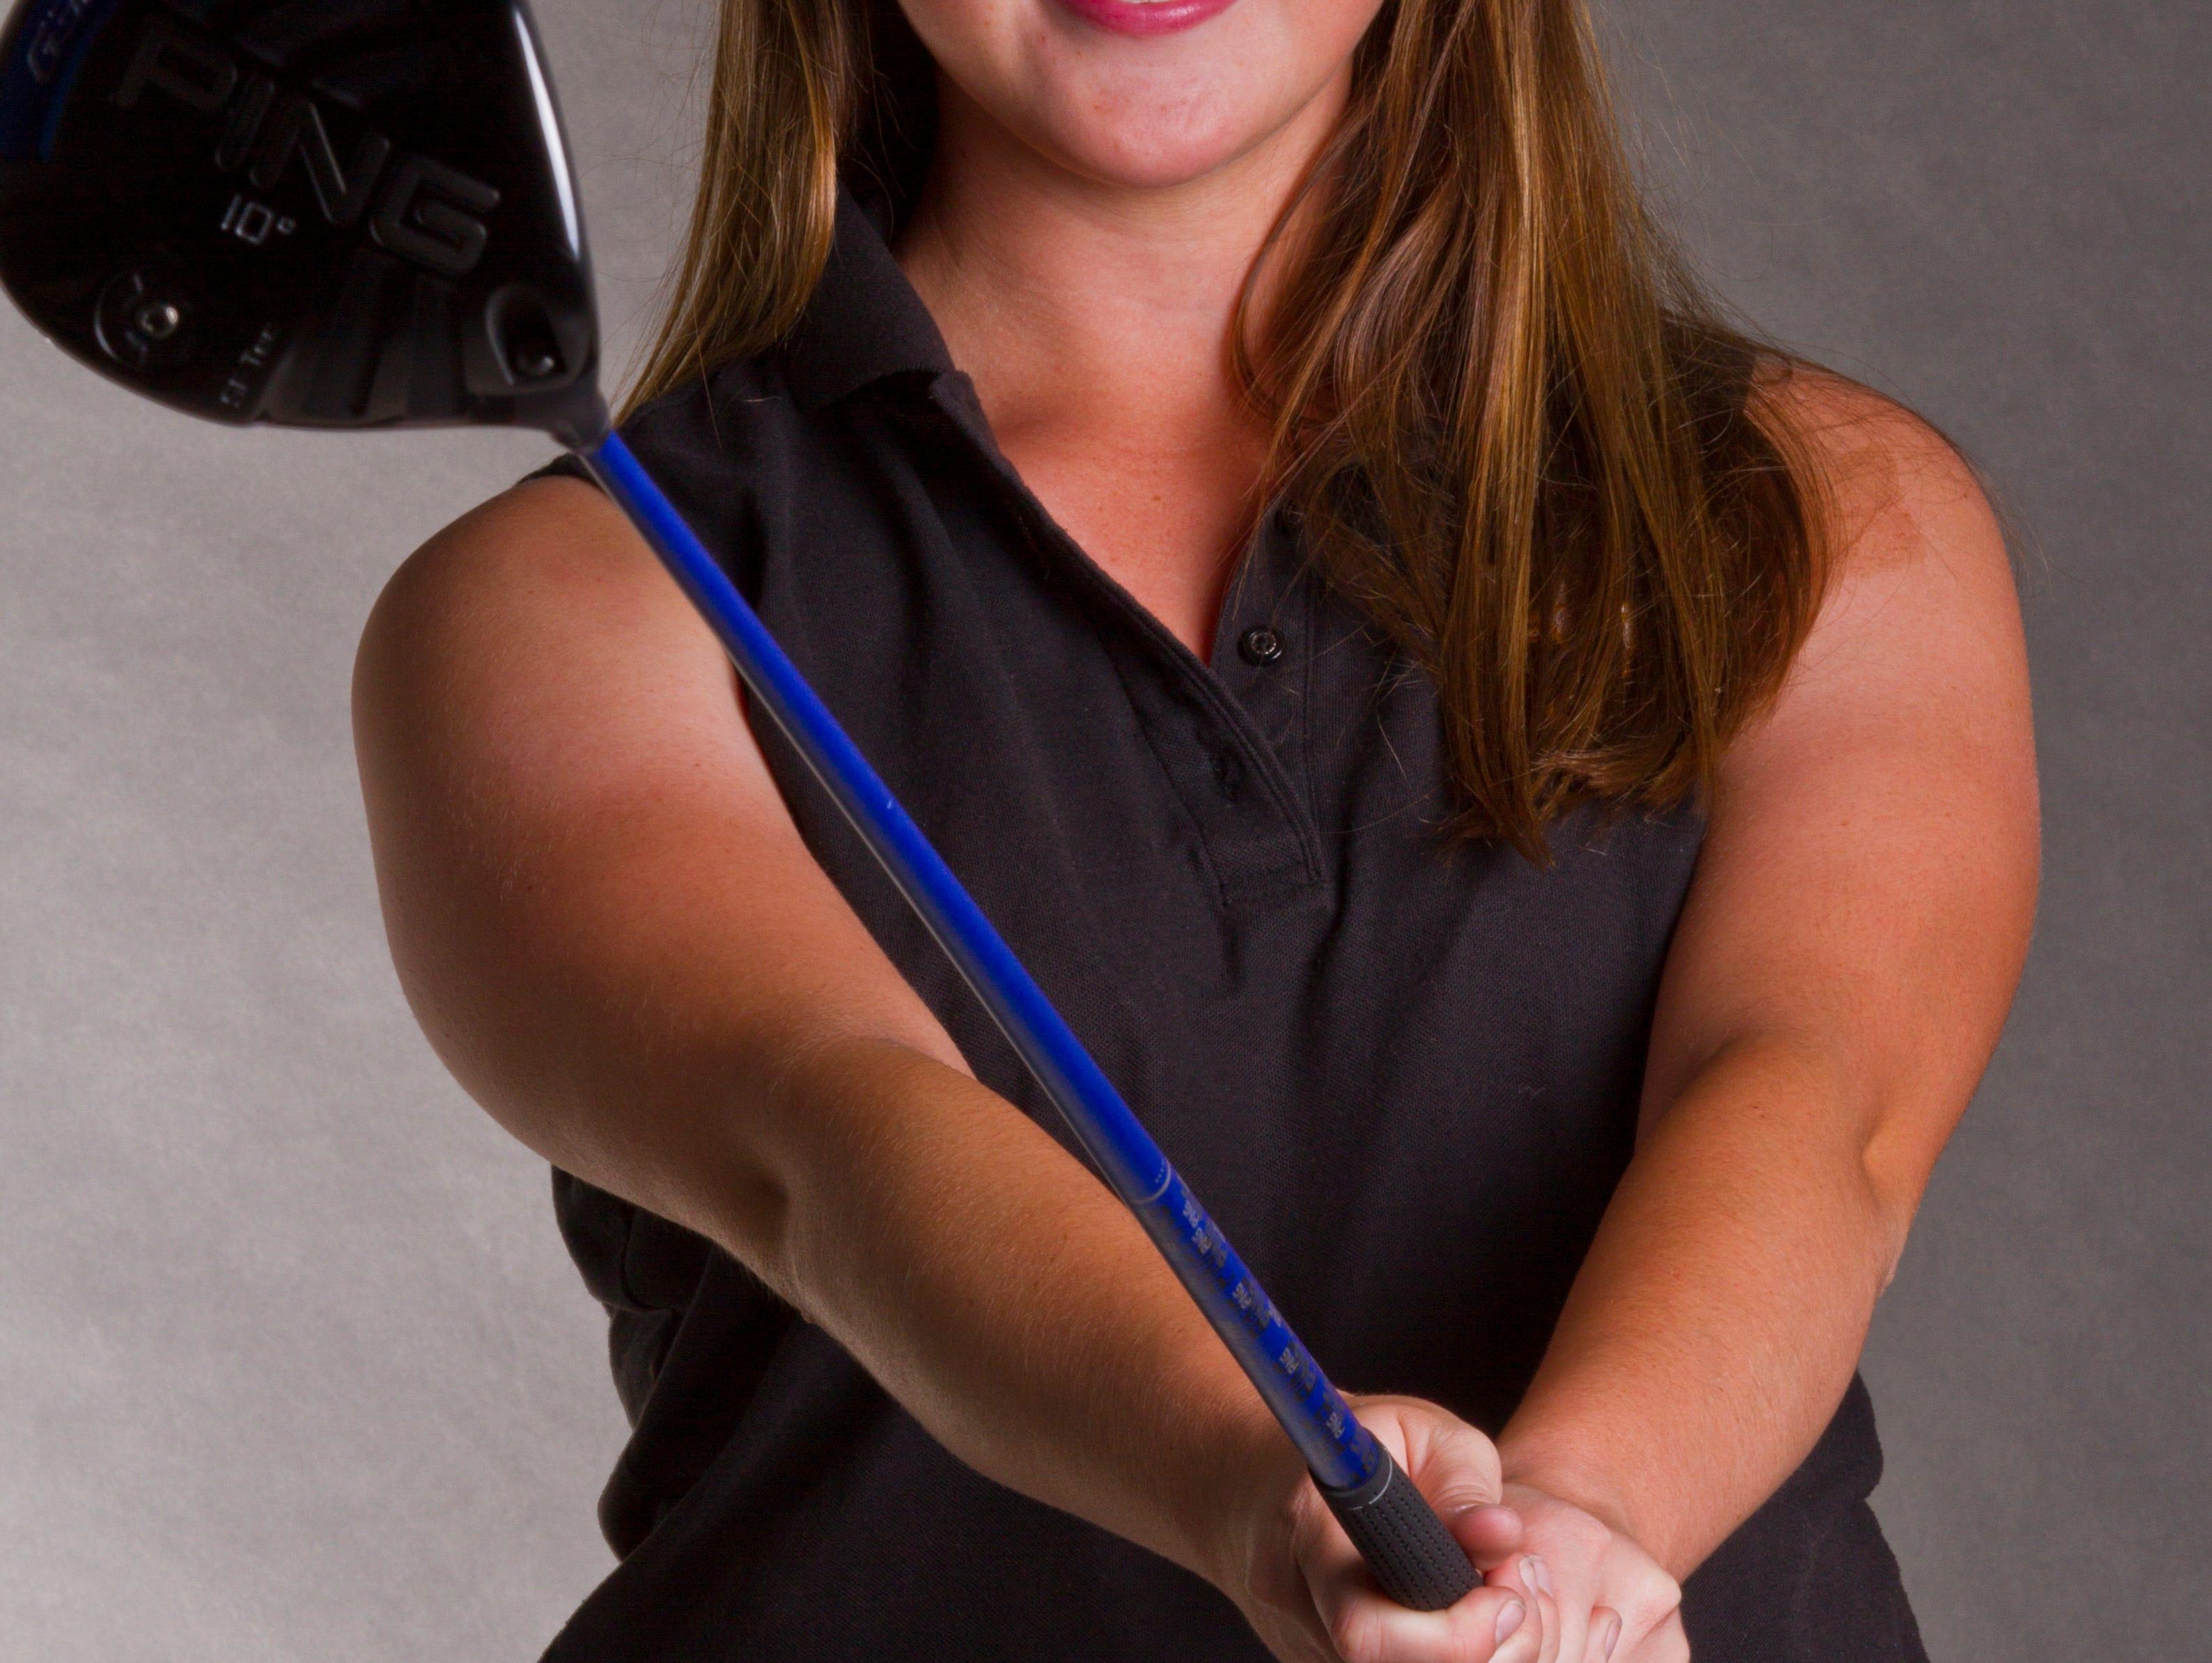 Hallianne Hobson, 17, Bishop Verot High School; All Area Golf - 2015-2016 school year